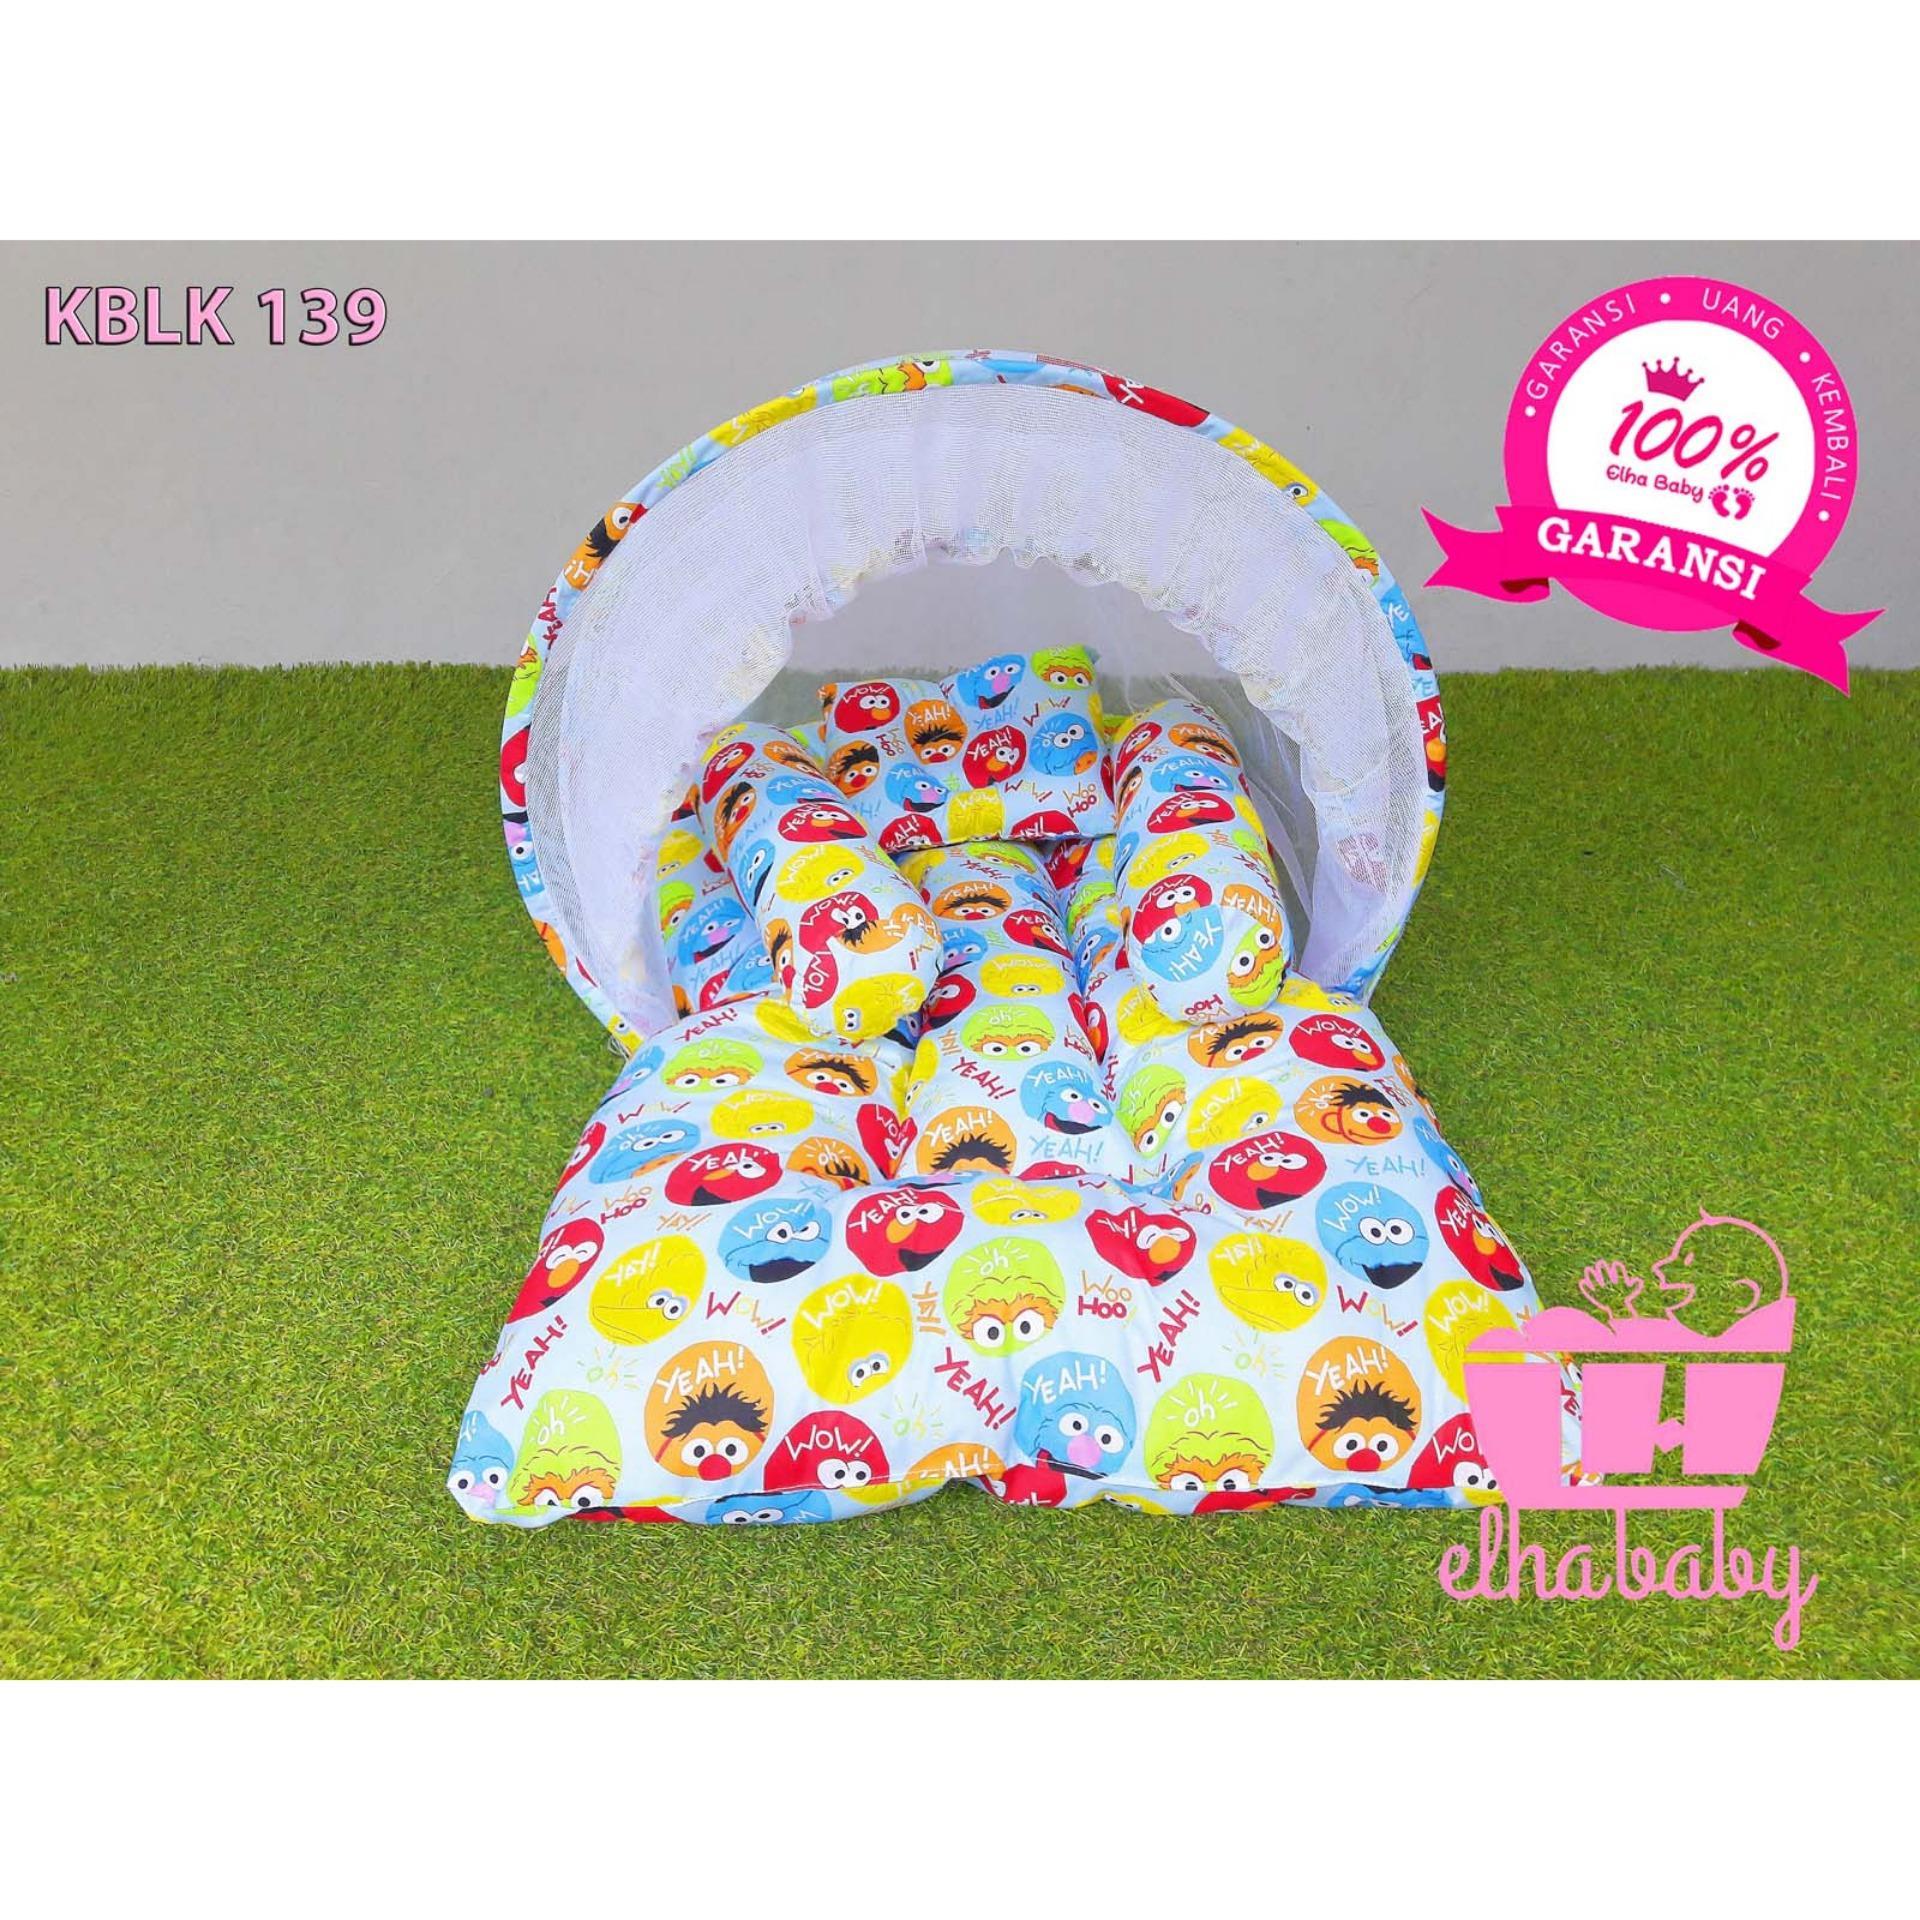 Grosir Elhababy KBLK 139 Kasur Bayi Lipat Kelambu Sesame Street Elmo Edisi 2 I Tempat Tidur Bayi I Babyshop